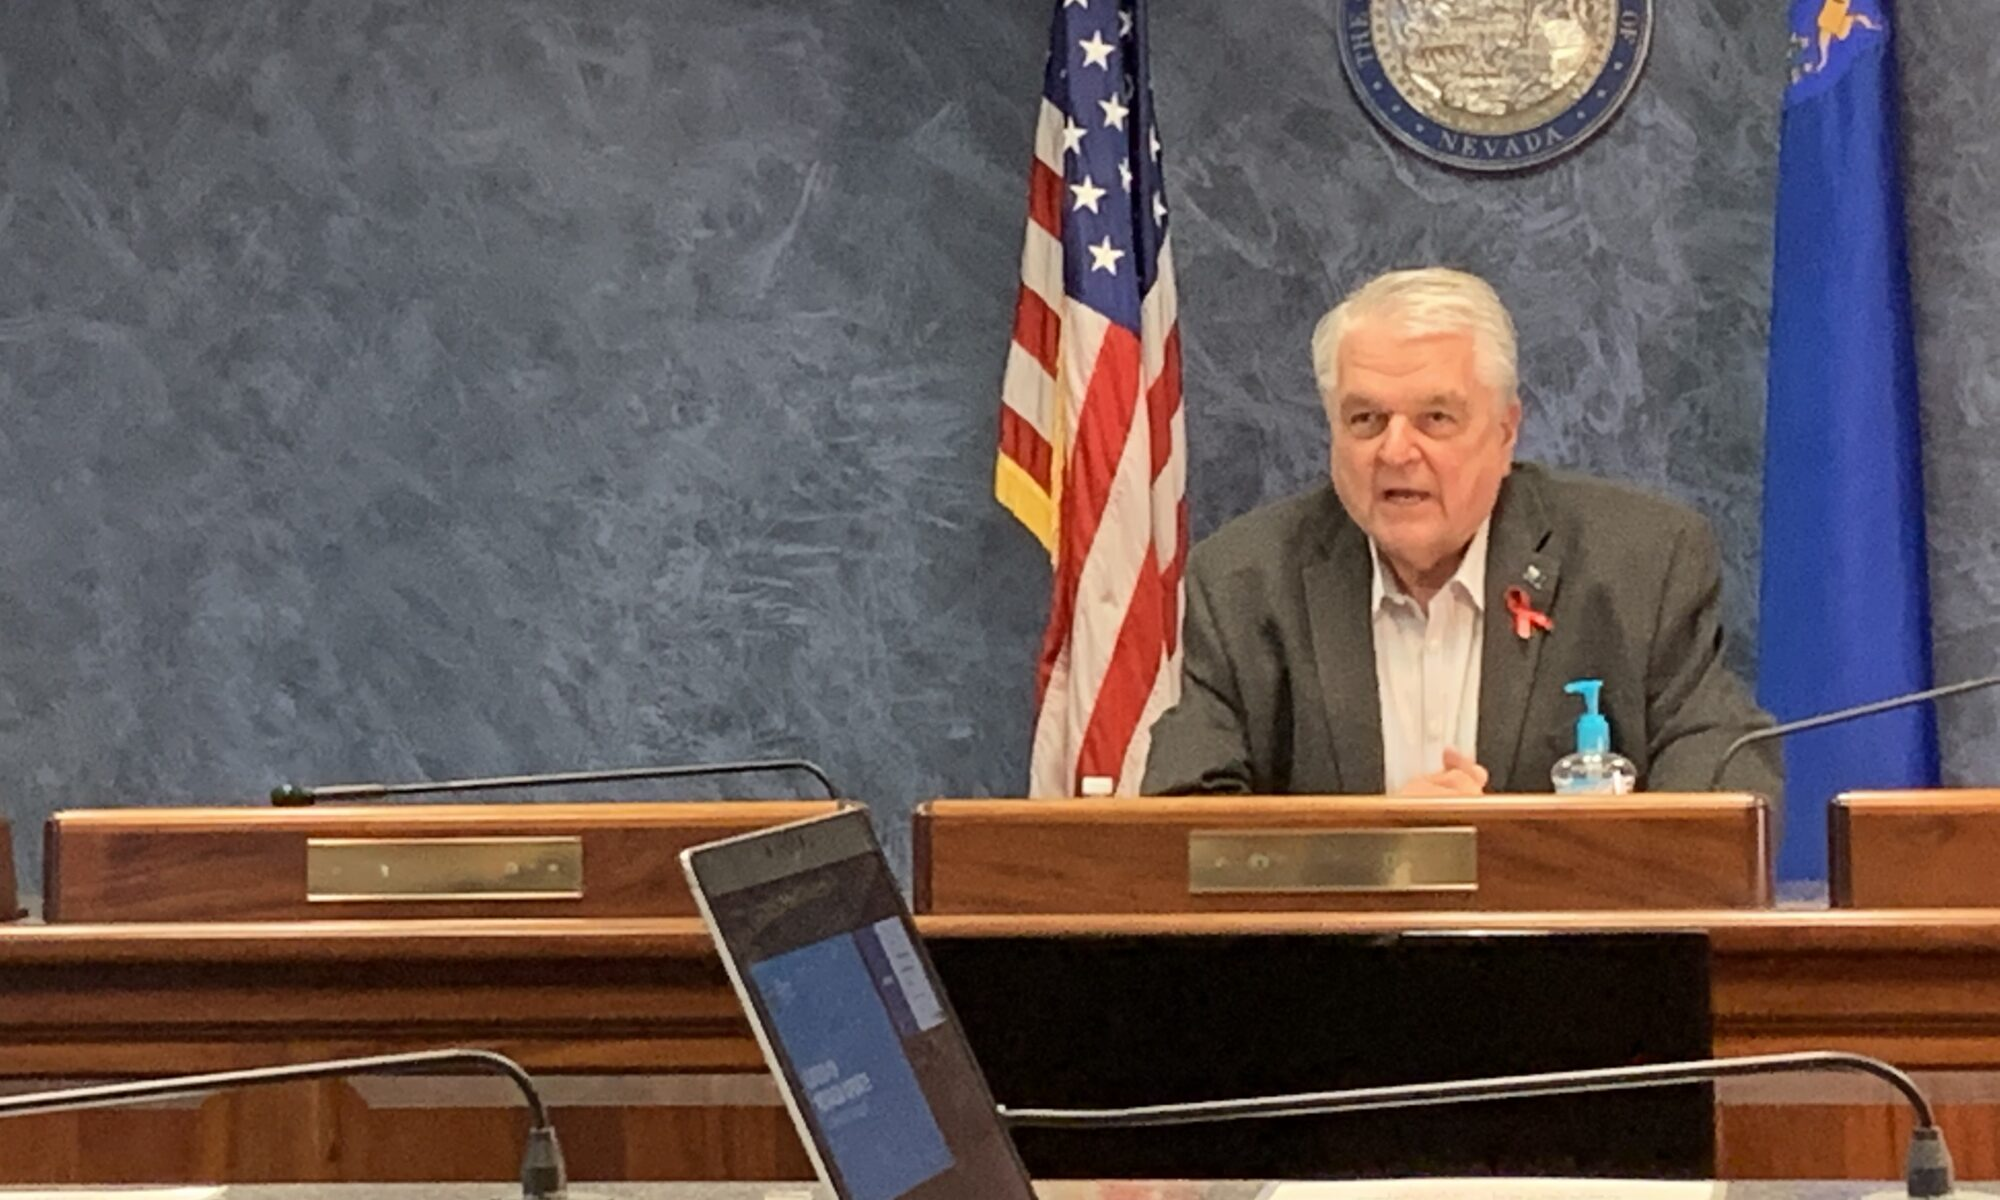 Nevada Gov. Steve Sisolak during a media briefing.